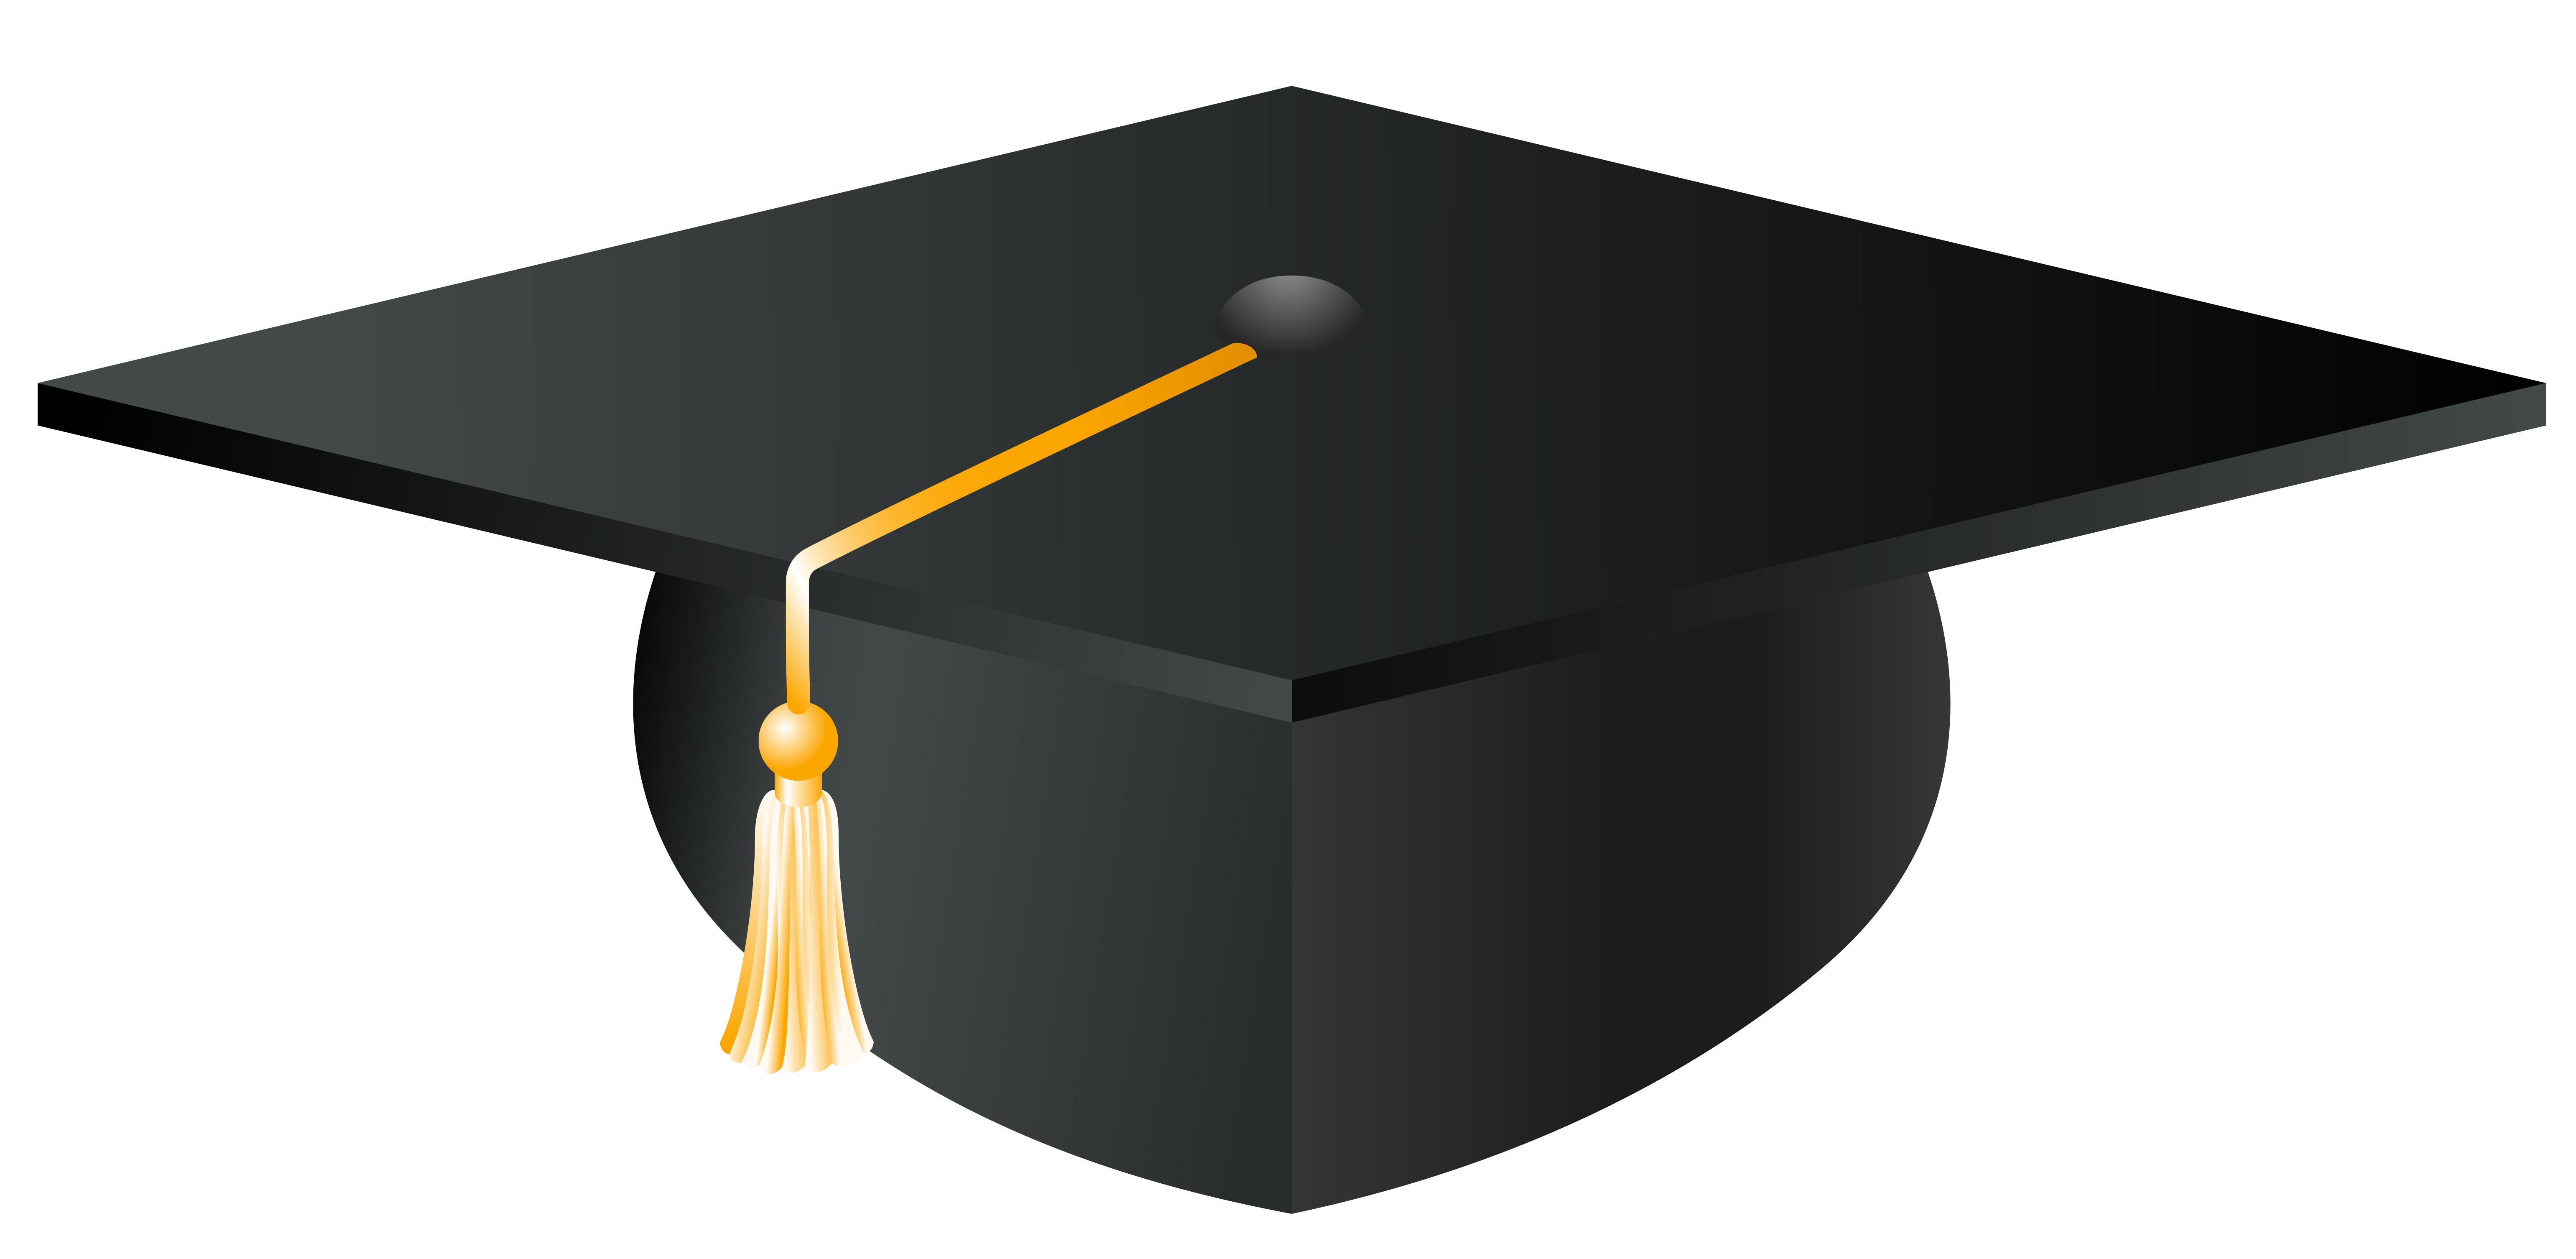 graduation cap drawings free download best graduation christian clipart images free christian clipart images of crosses